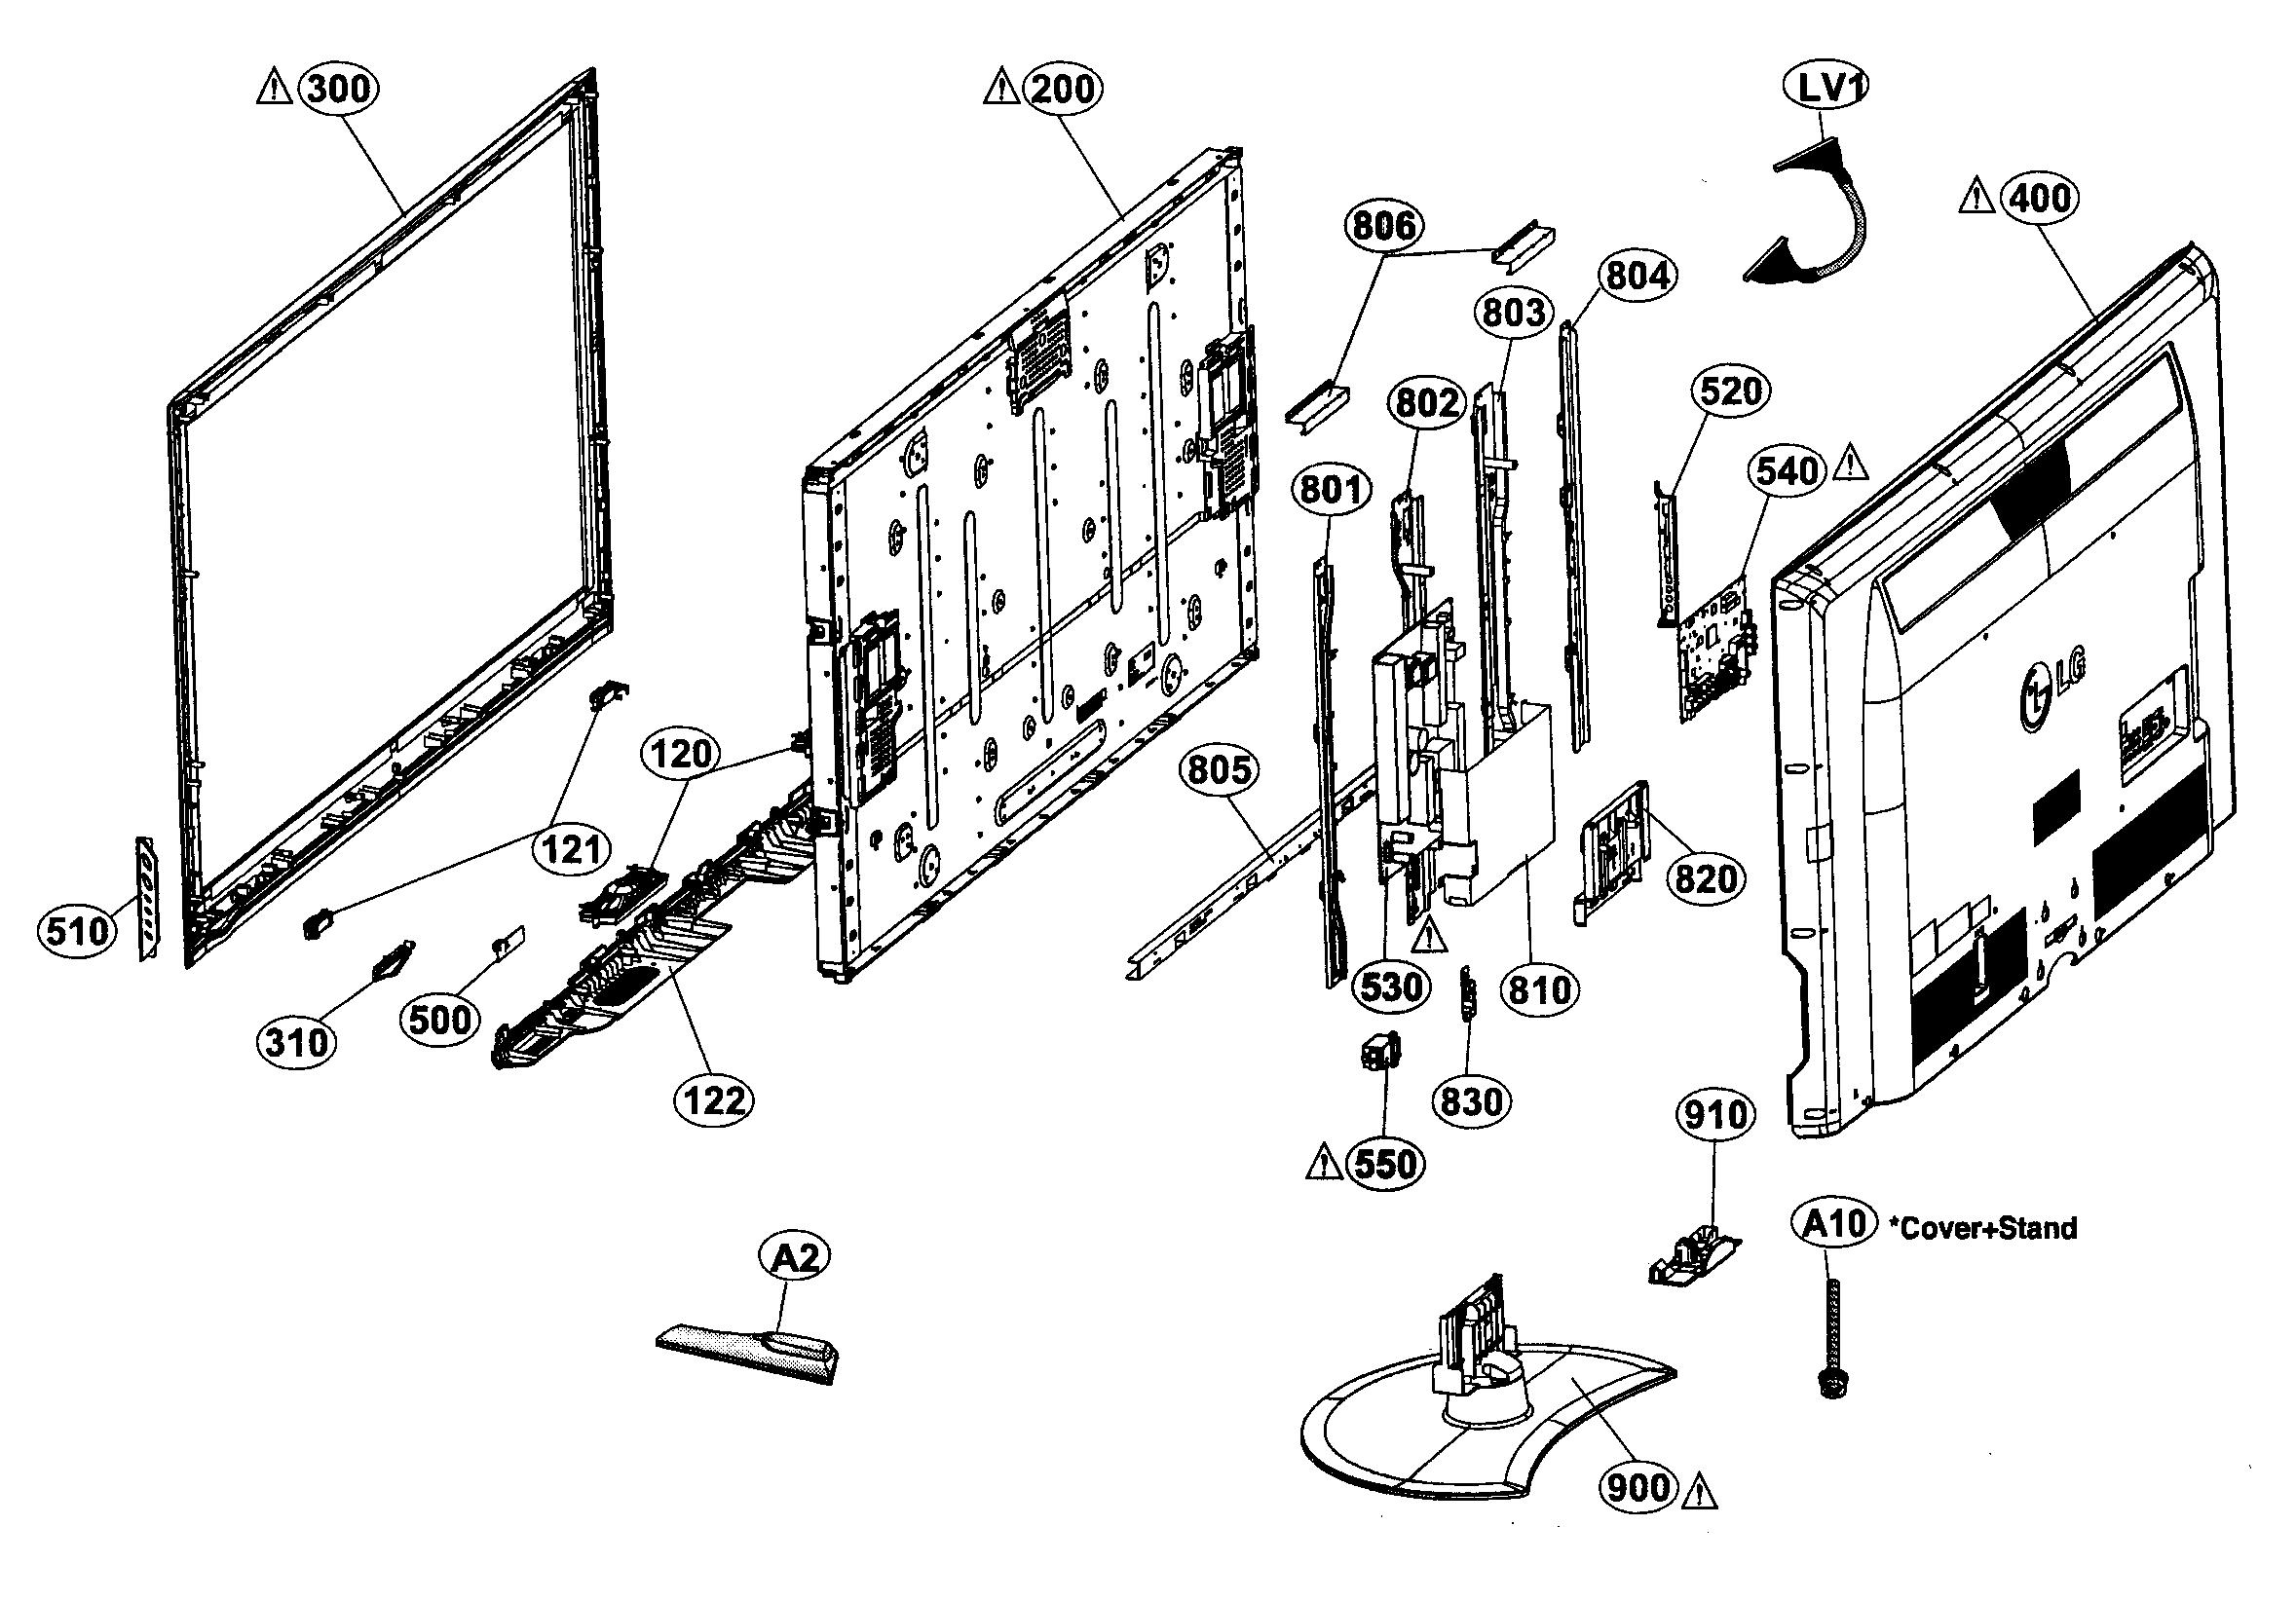 Toshiba Tv Parts Diagram Seniorsclub It Schematic Frequency Schematic Frequency Pietrodavico It